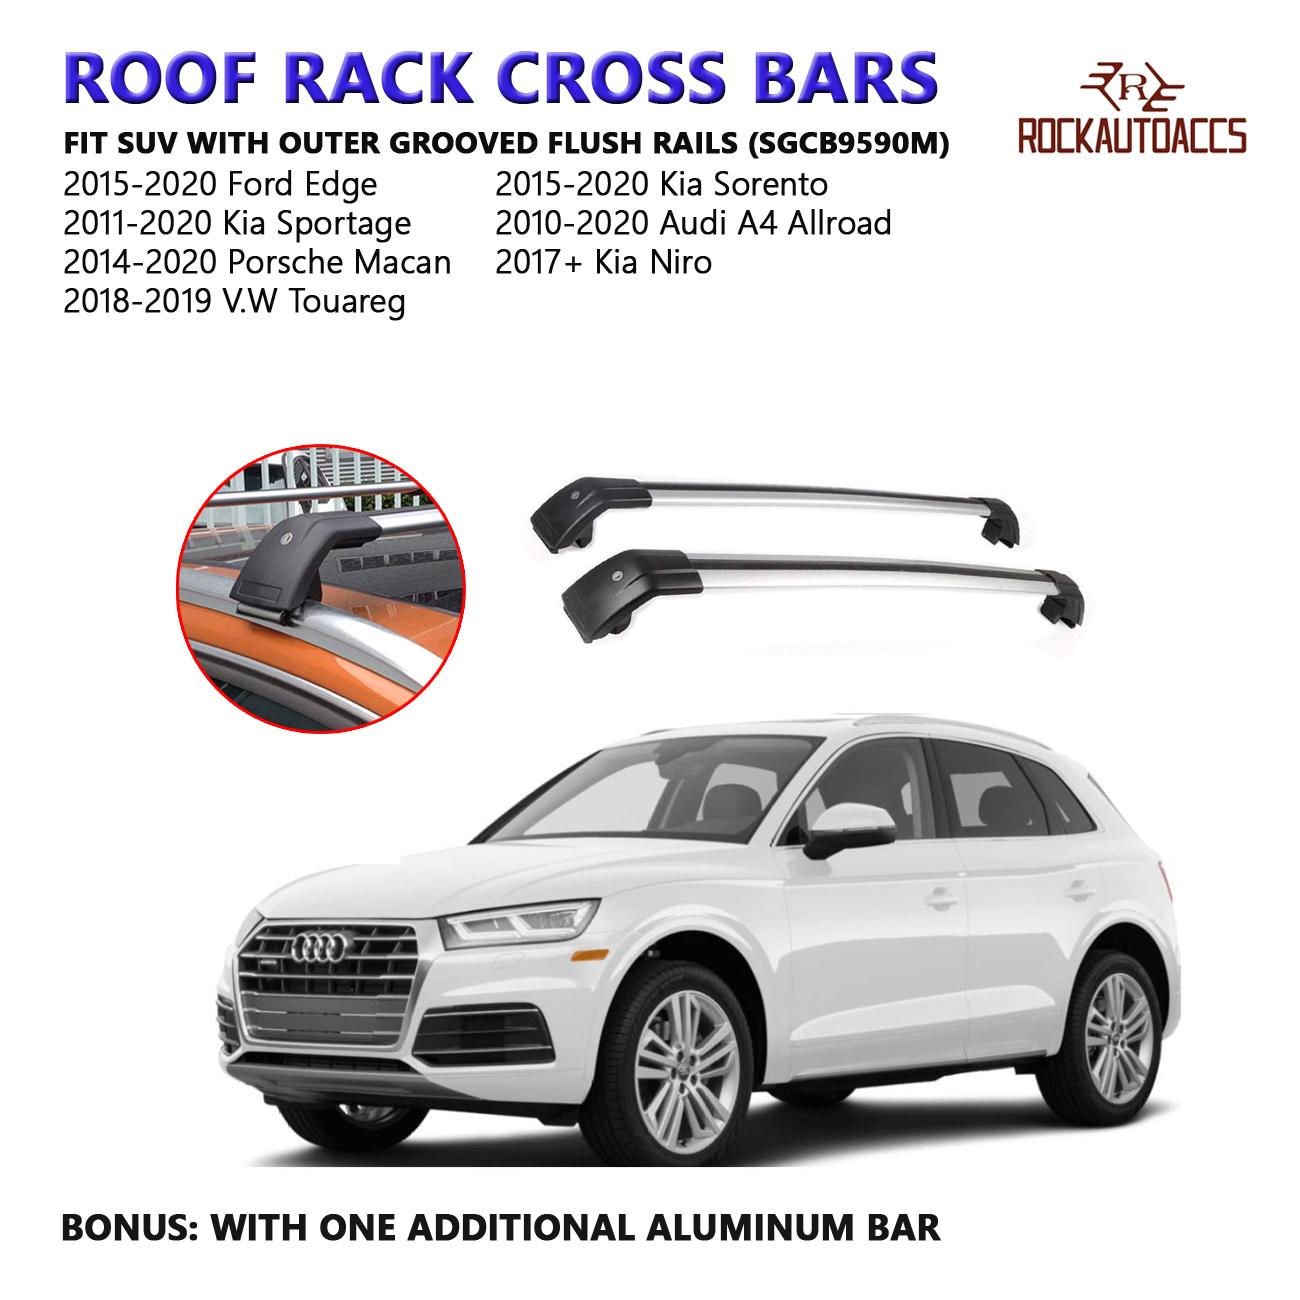 Top Roof Rack Fit For KIA Niro 2017 2018 2019 Baggage Luggage Cross Bar crossbar